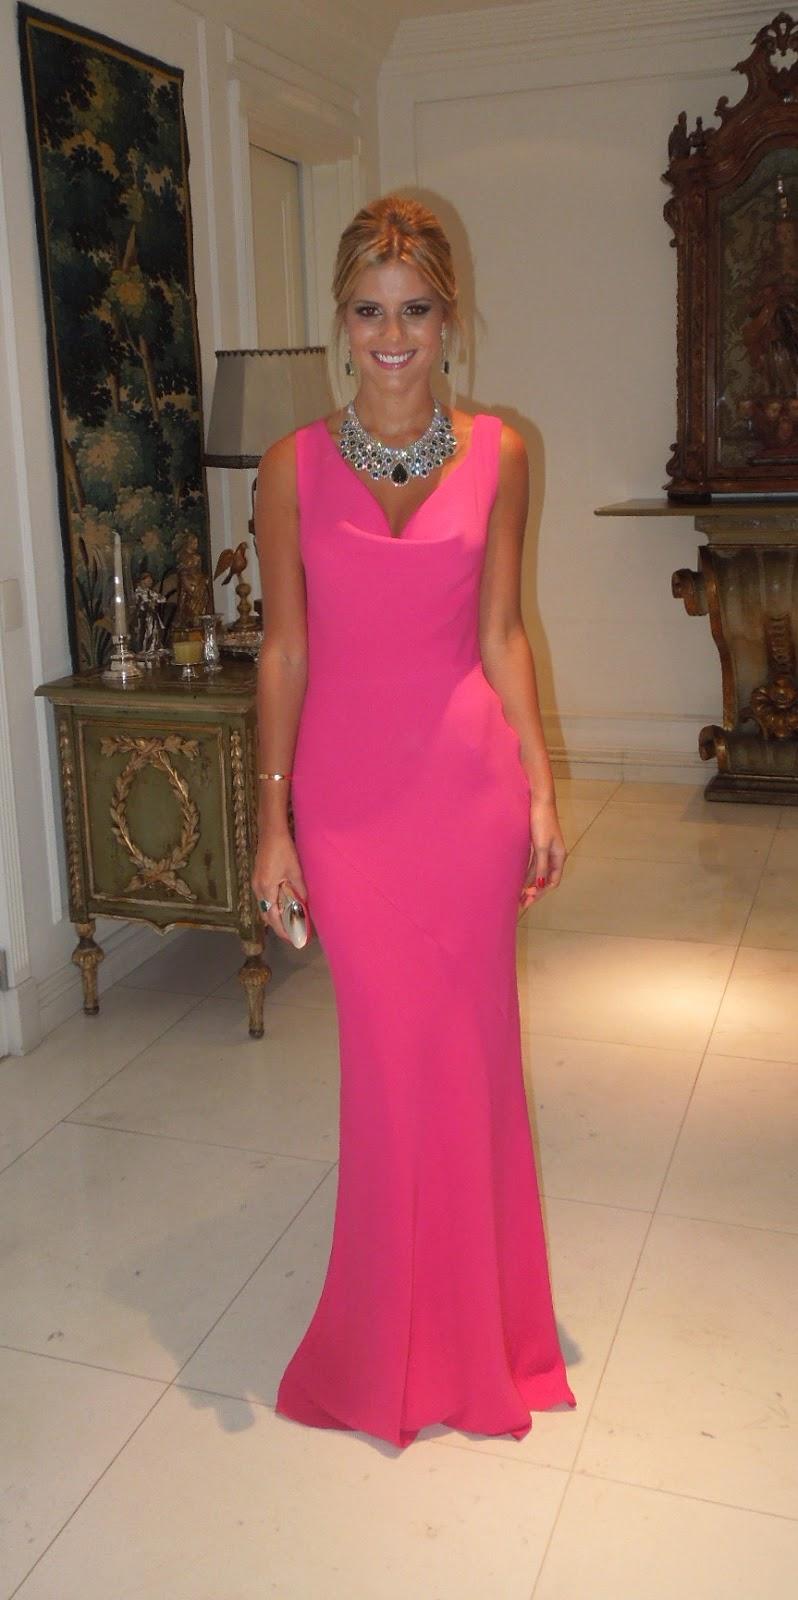 Vestido rosa joia verde